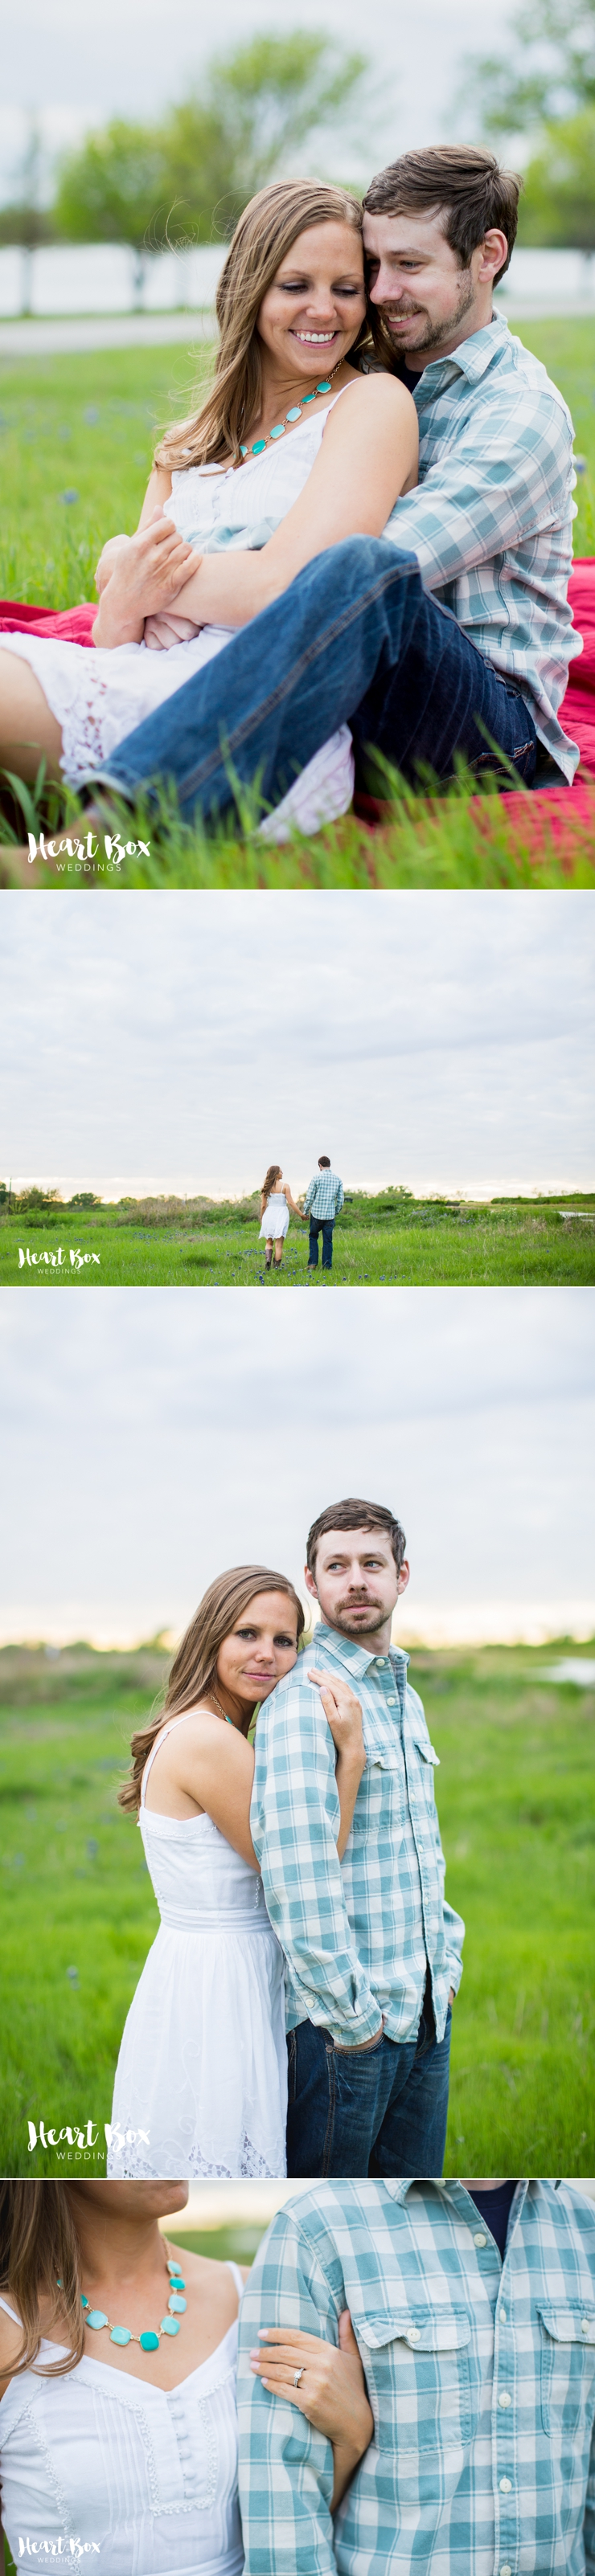 Allison + Matt Engagement Blog Collages 4.jpg